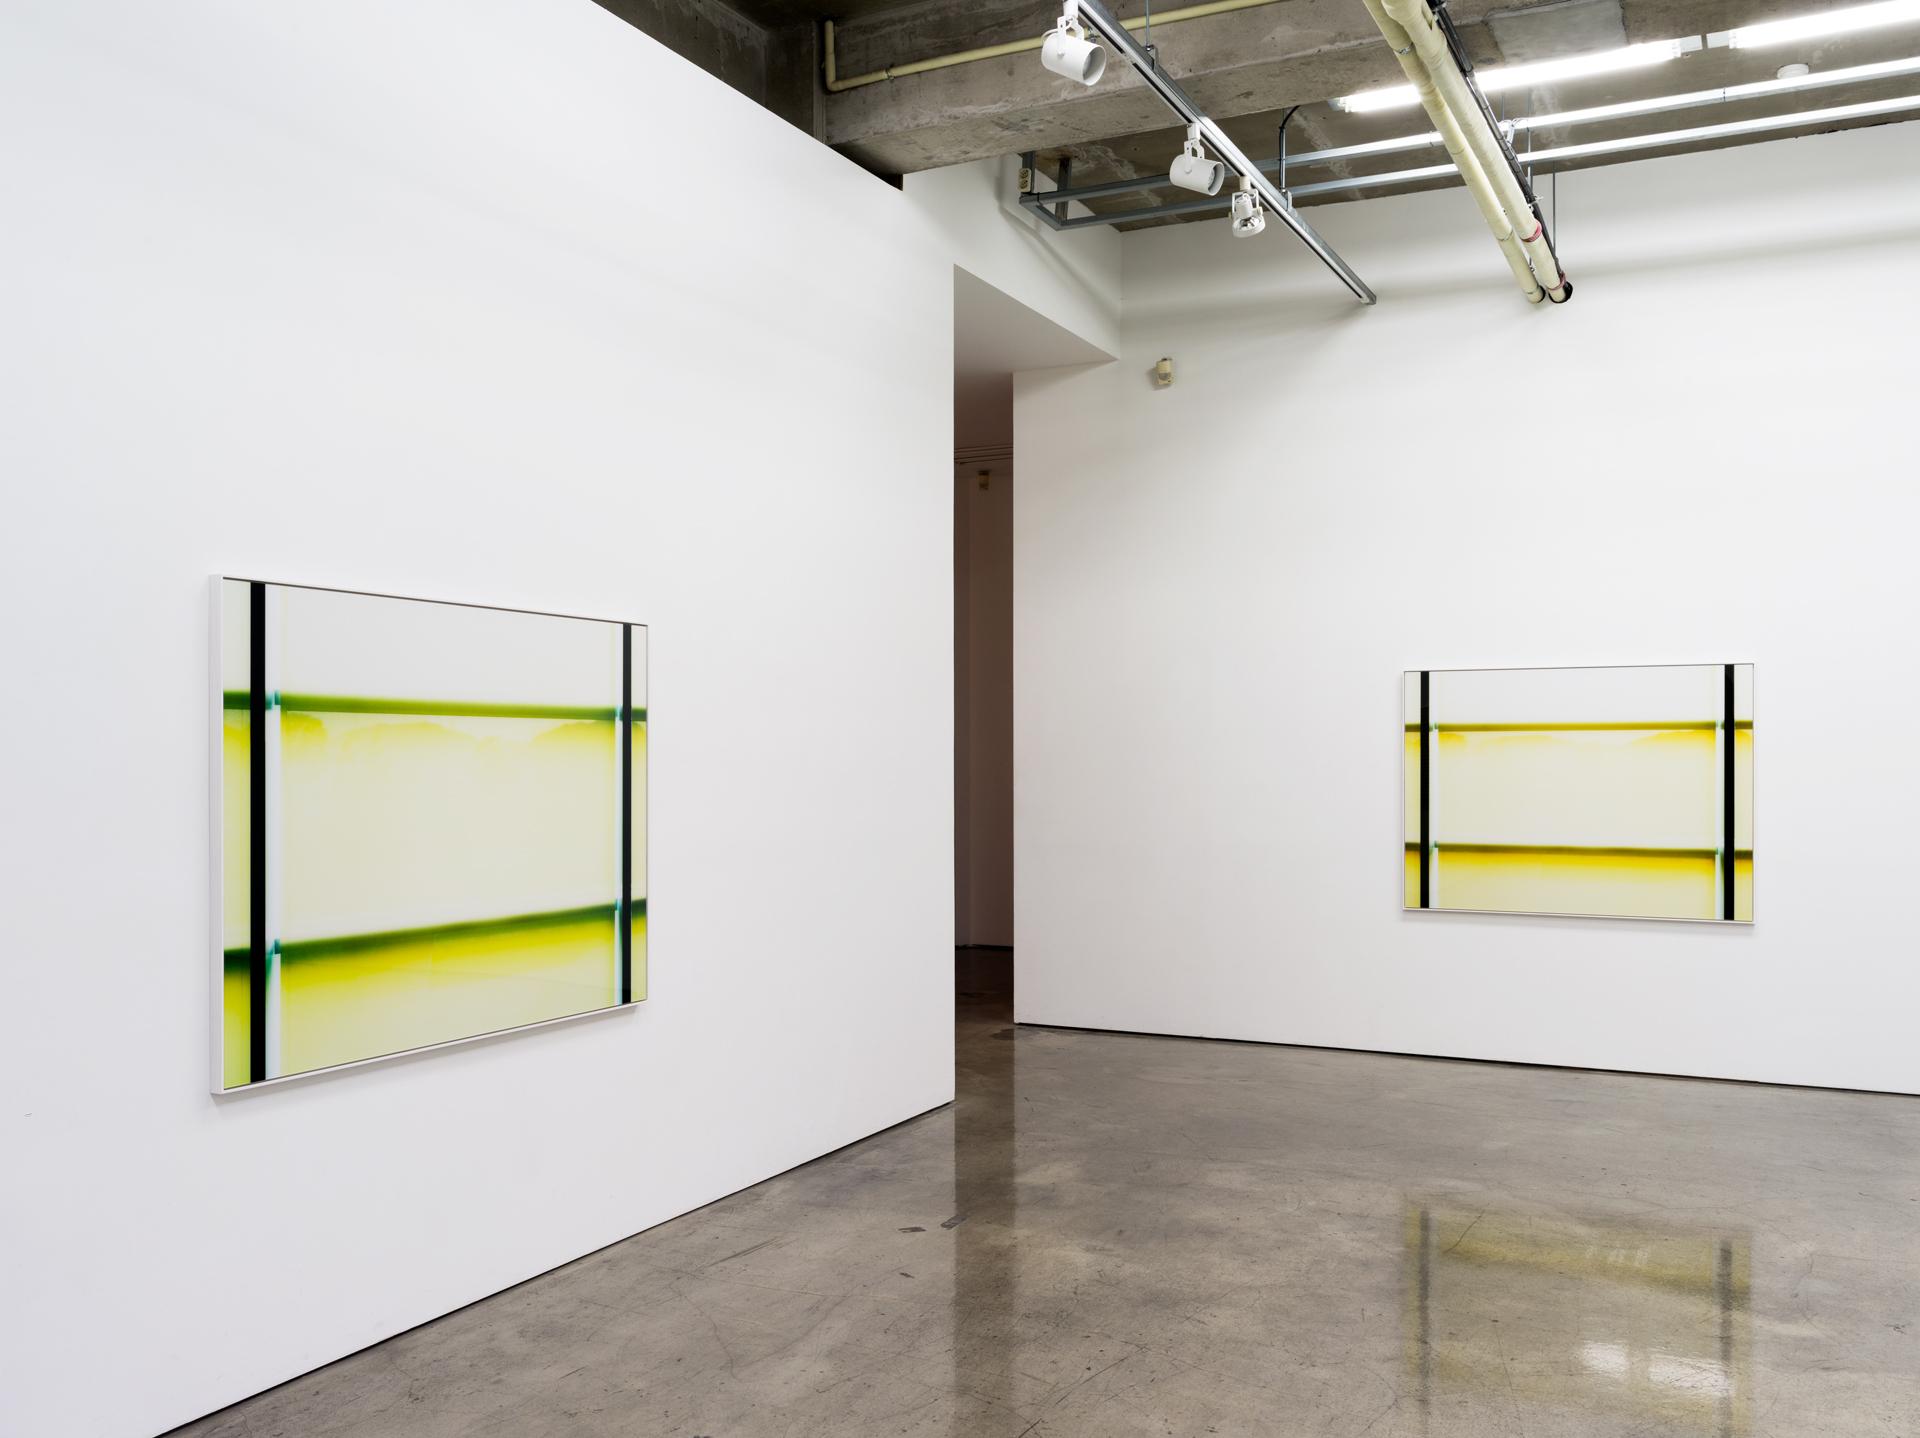 2016, Bundo Gallery 02